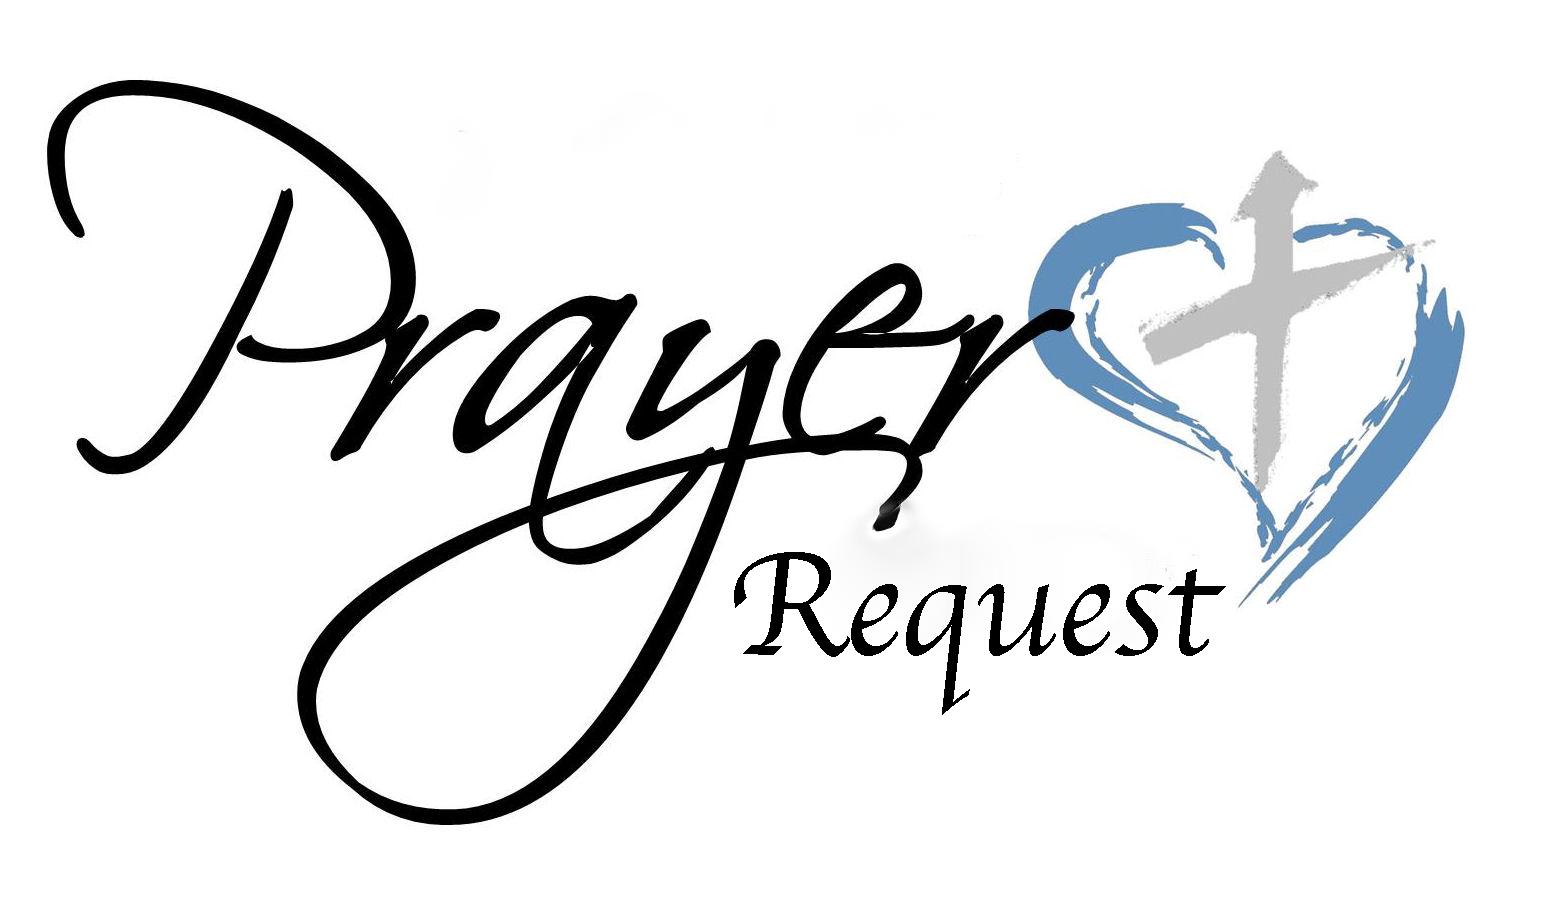 prayer clip art free clipart panda free clipart images rh clipartpanda com free prayer clip art images free prayer clipart pictures